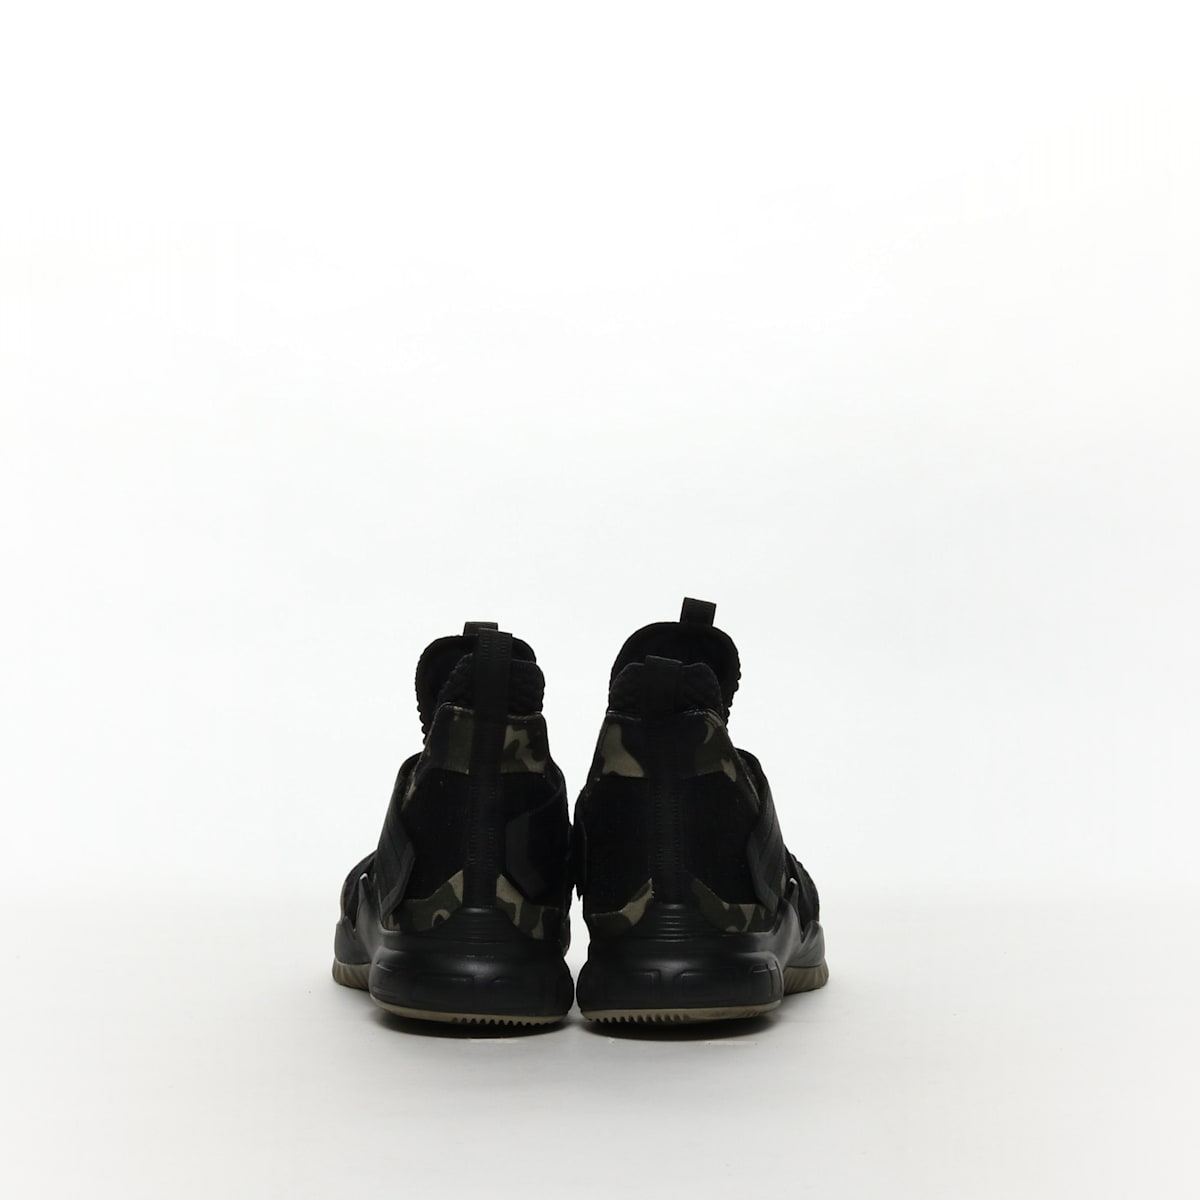 ce50ba068265 LeBron Soldier 12 SFG - BLACK HAZEL RUSH BLACK – Resku